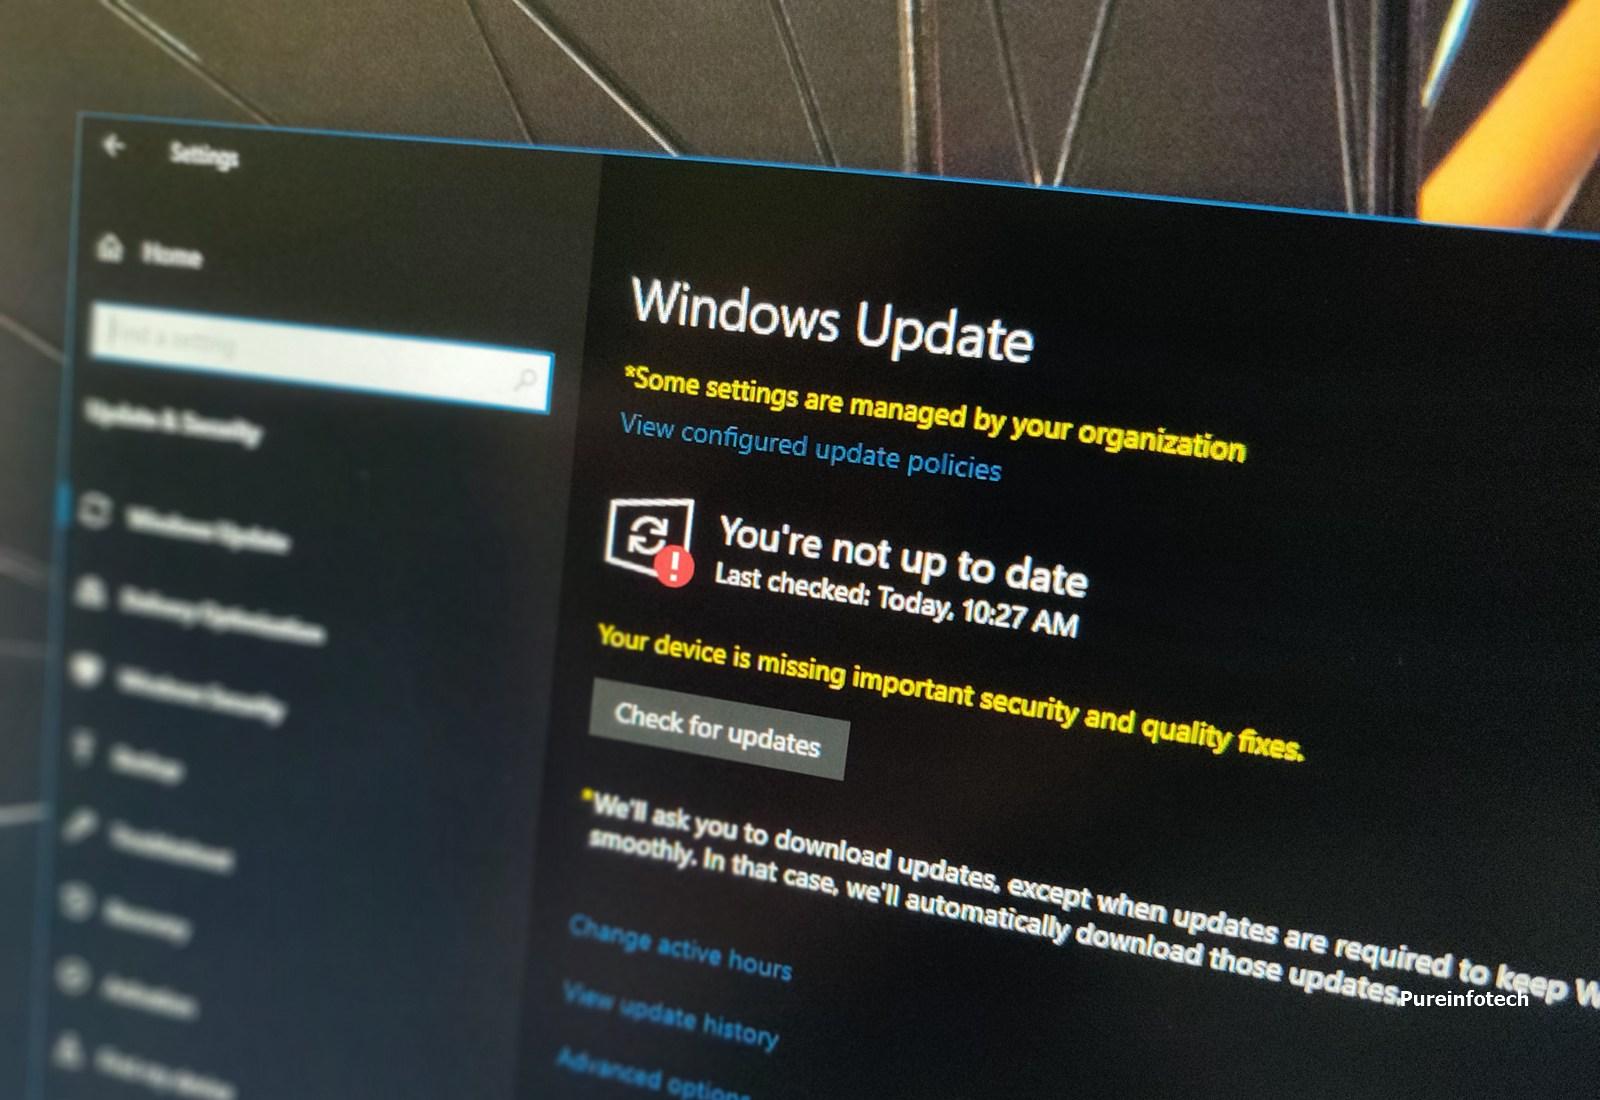 Windows 10 updates settings